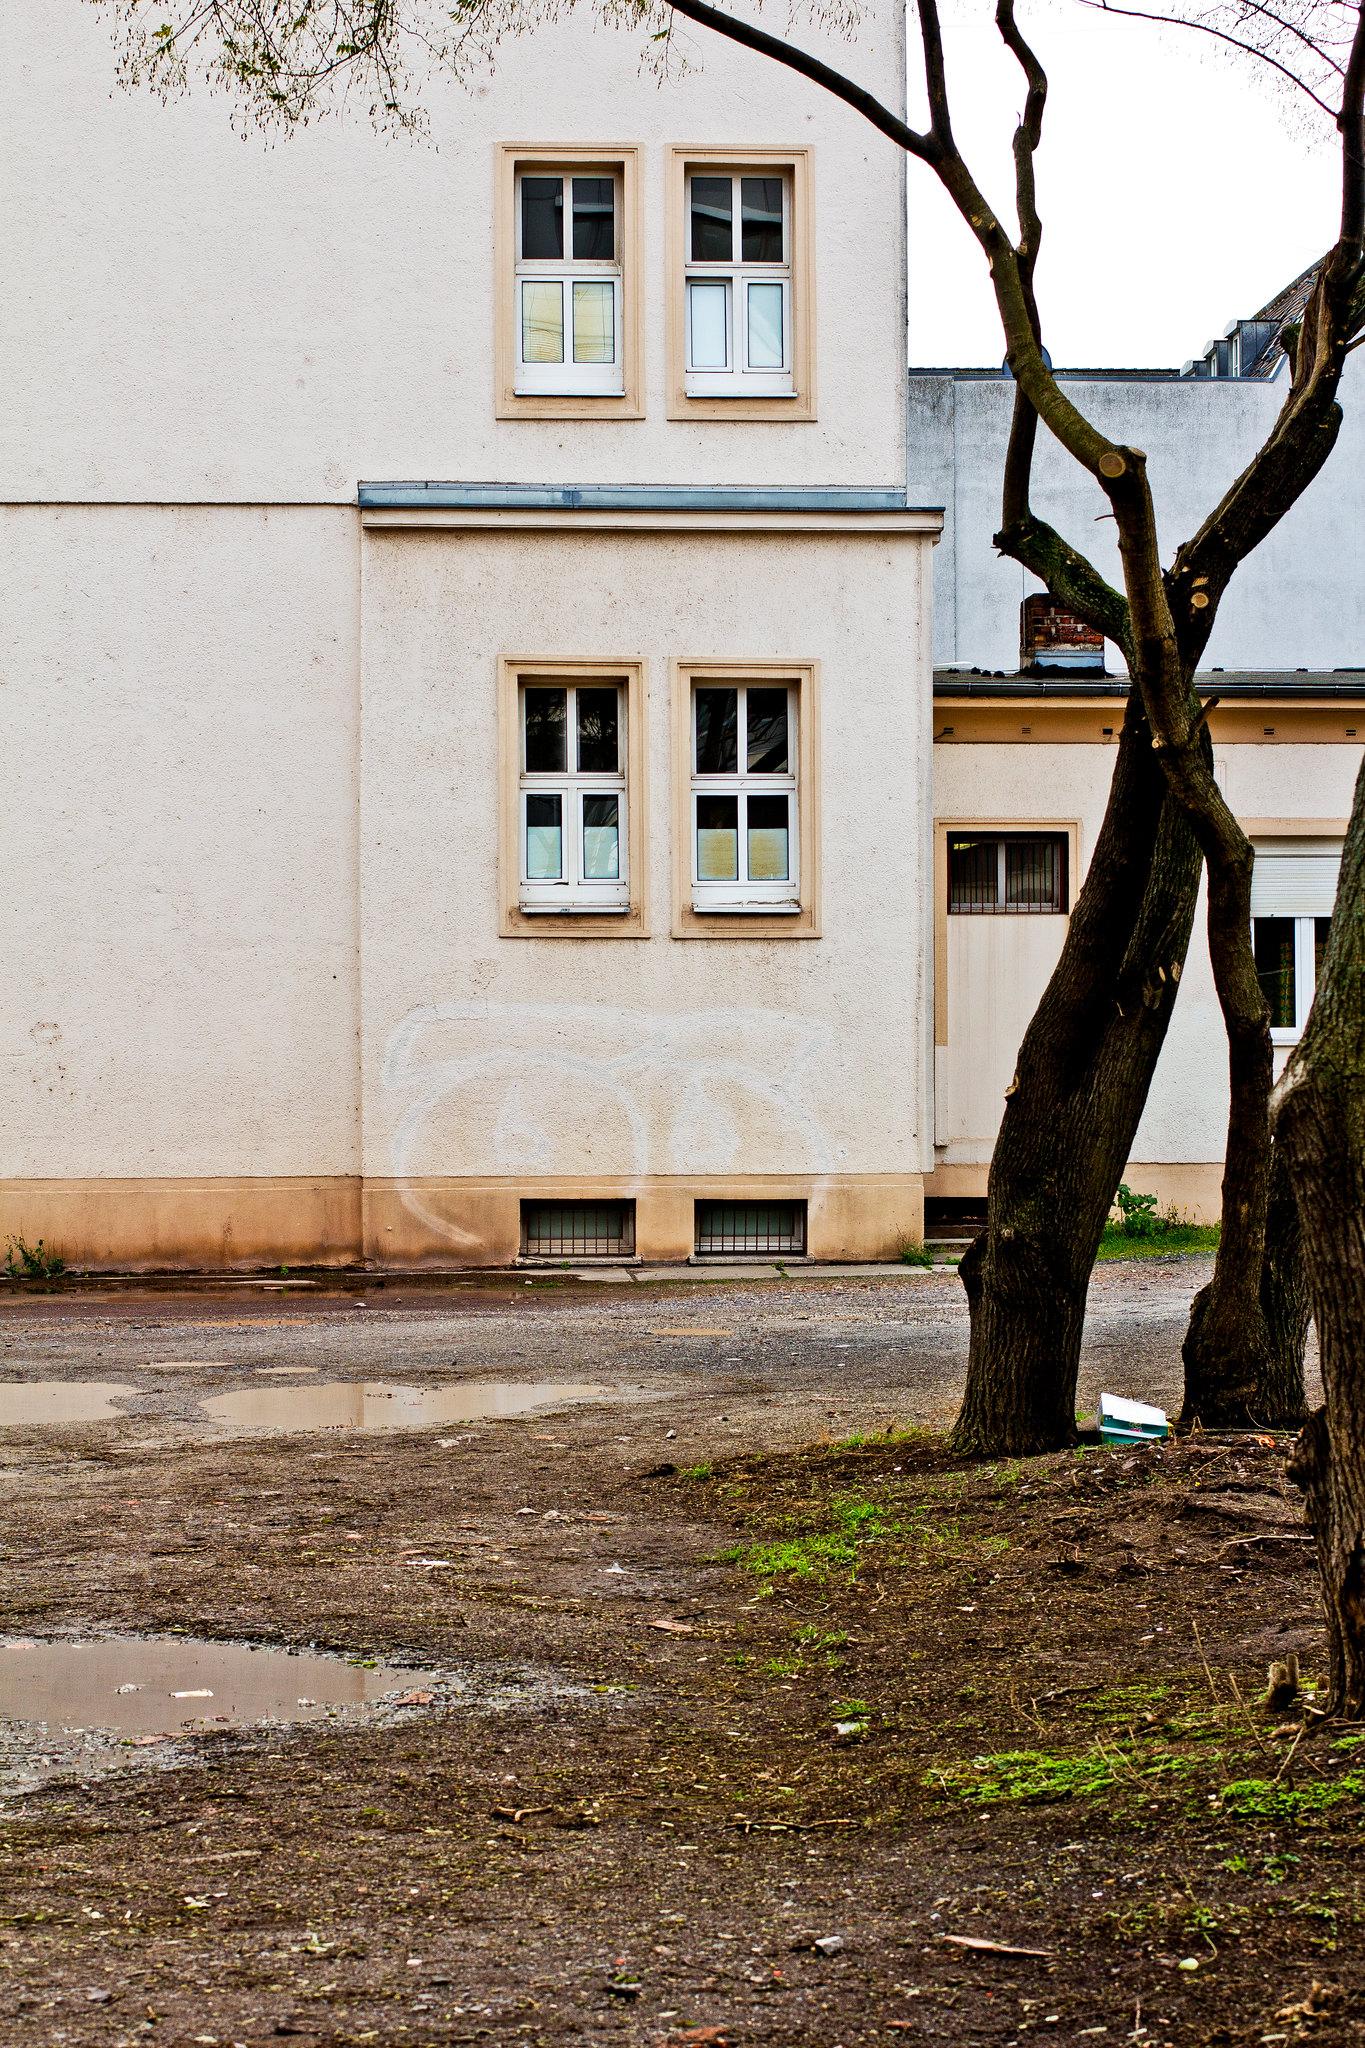 magdeburger verkehrsbetriebe ehemals bankhaus // magdeburg